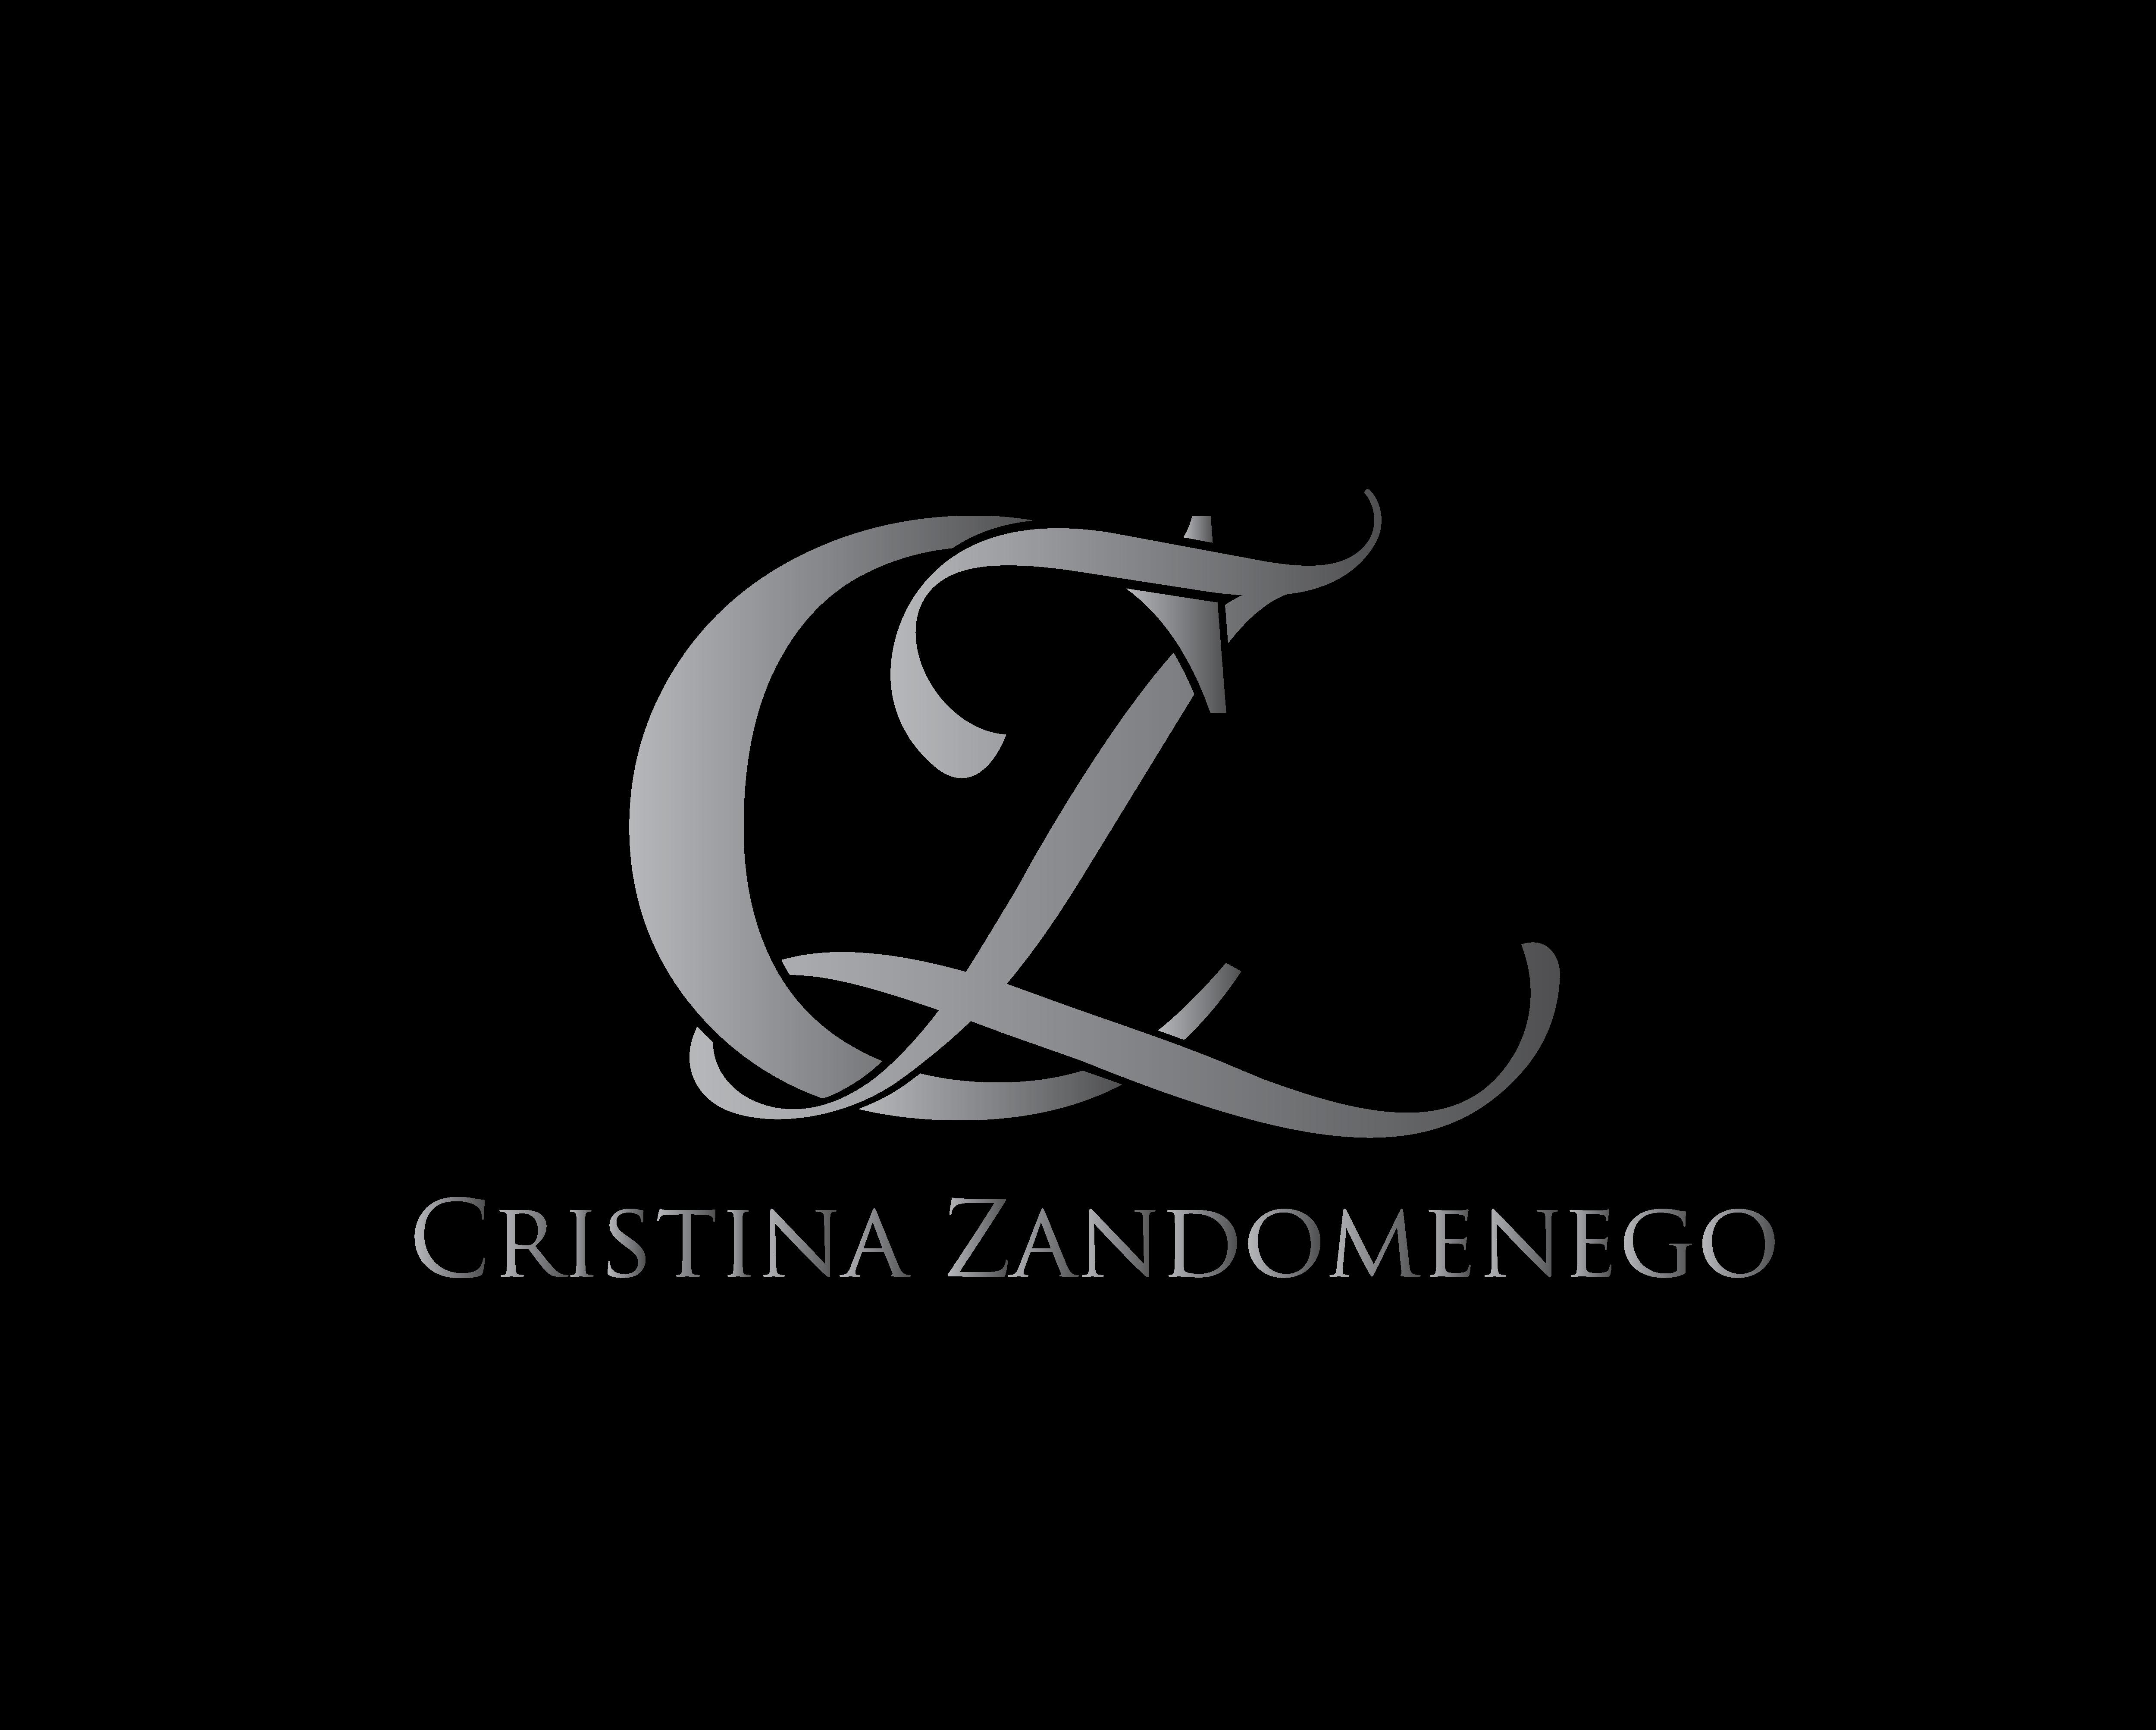 Cristina Zandomenego